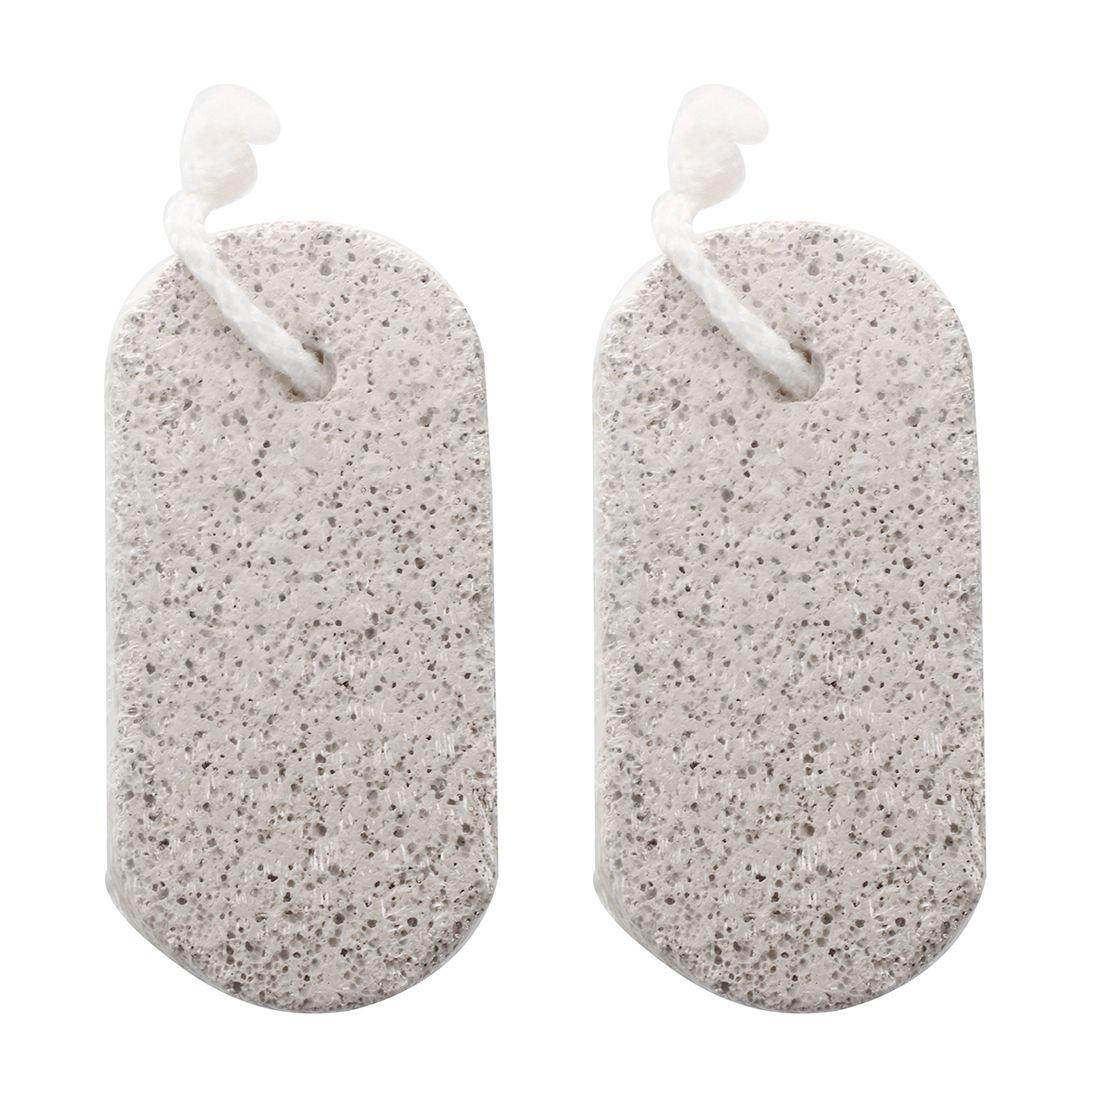 SODIAL(R) 2PCS Feet Skin Care Hard Cuticle Remover Pedicure Foot pumice stone Natural Bath 072937